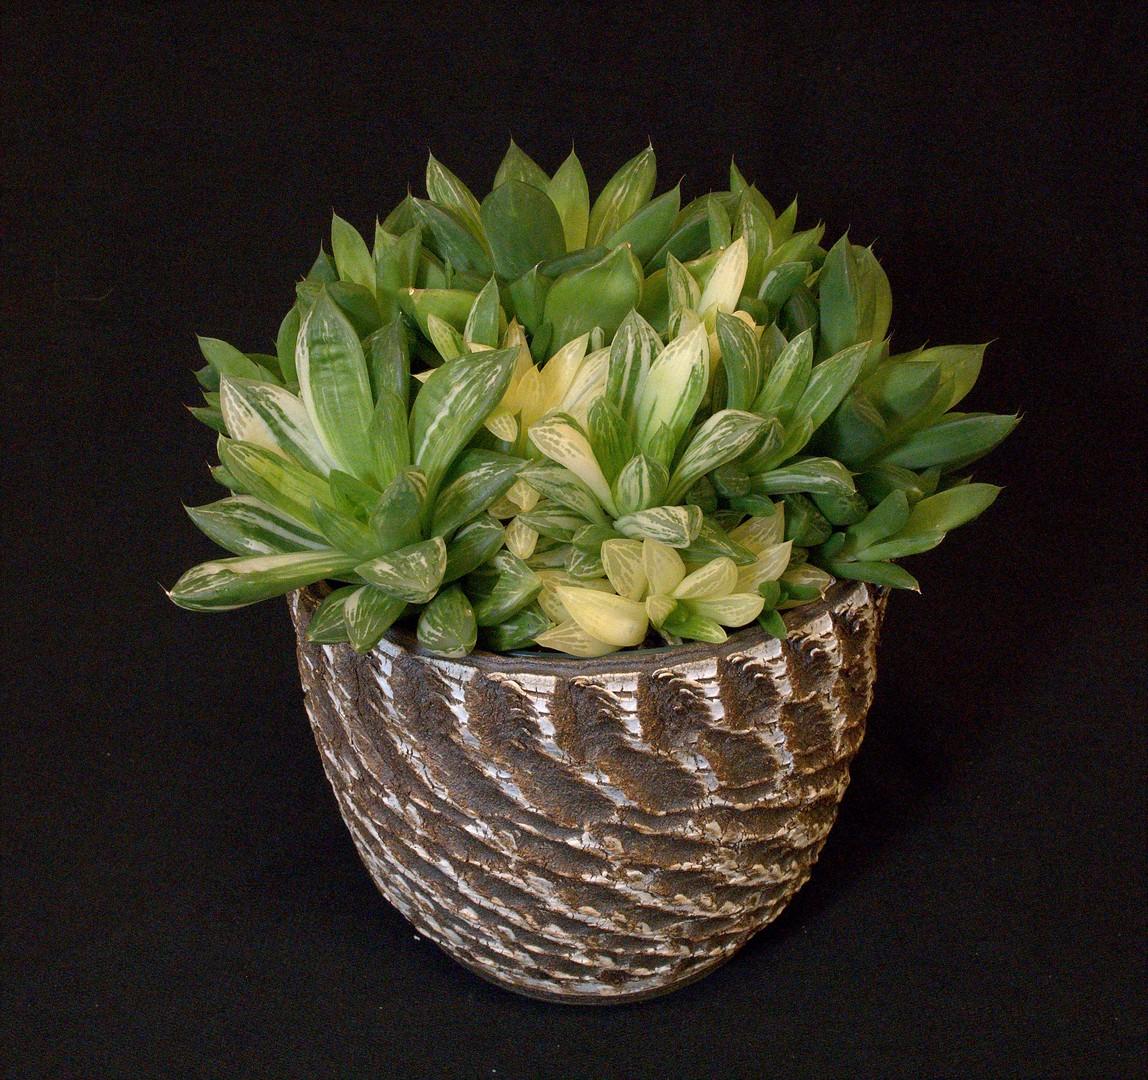 SCCSS 2020 February - Winner Intermediate Succulent - Coni Nettles - Haworthia cymbiformis